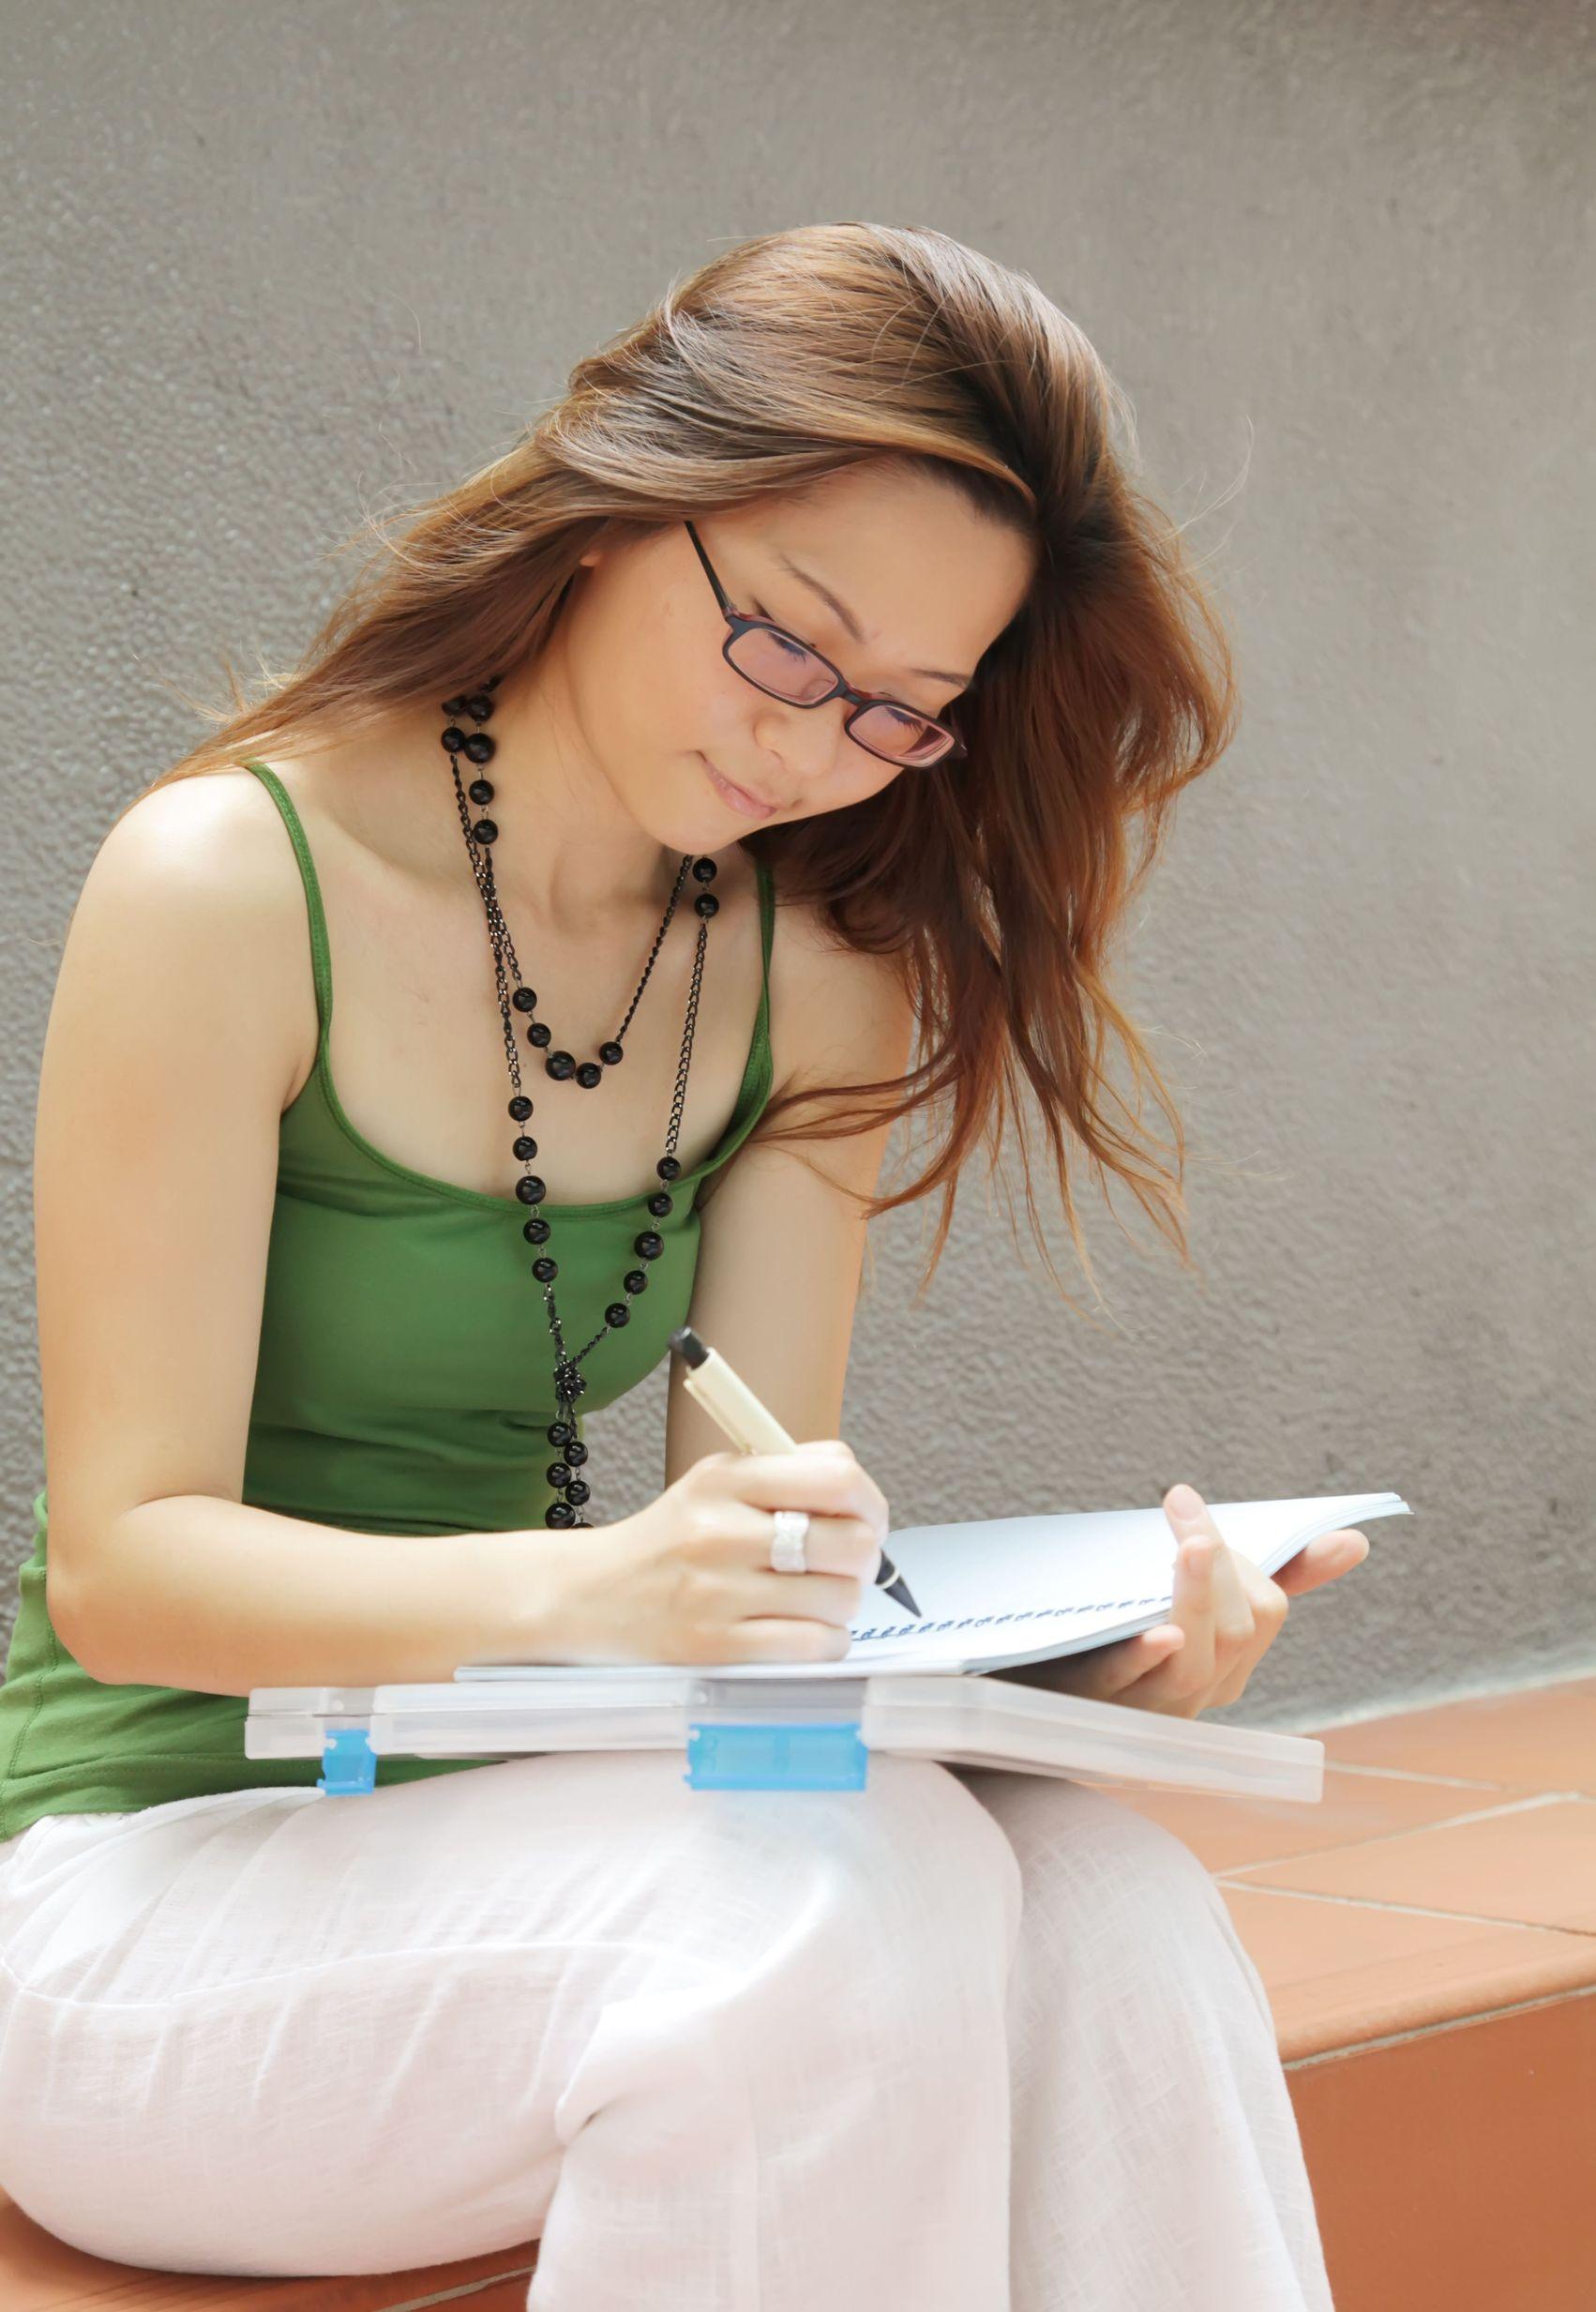 discursive essay teenage pregnancy